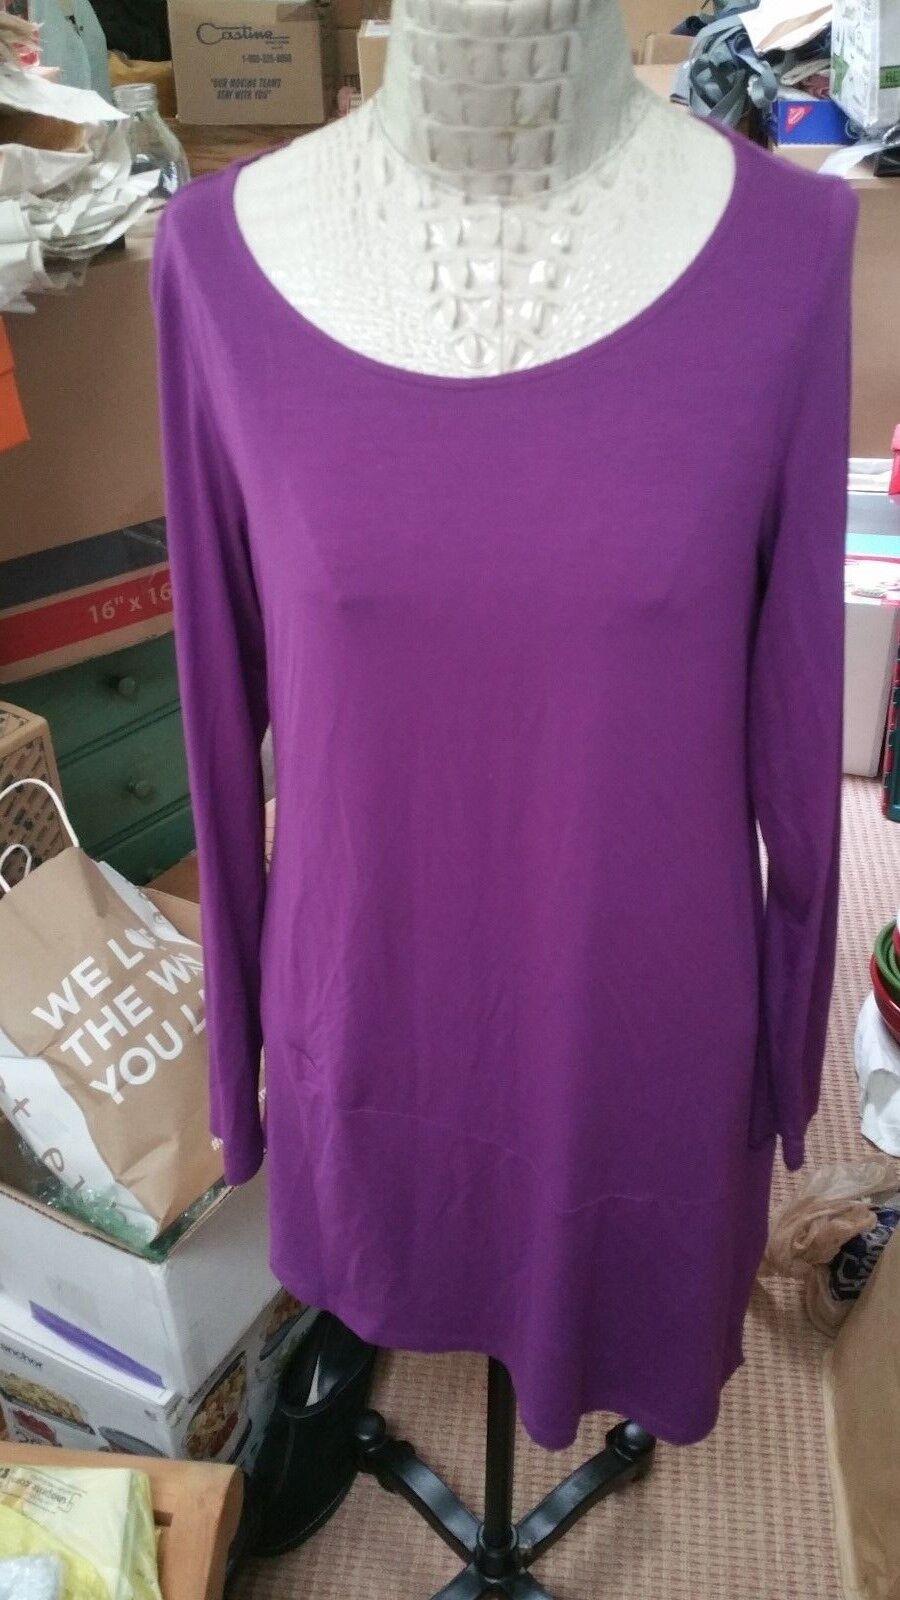 NWT Eileen Fisher viscose jersey assymetrical tunic in ultralila sz M